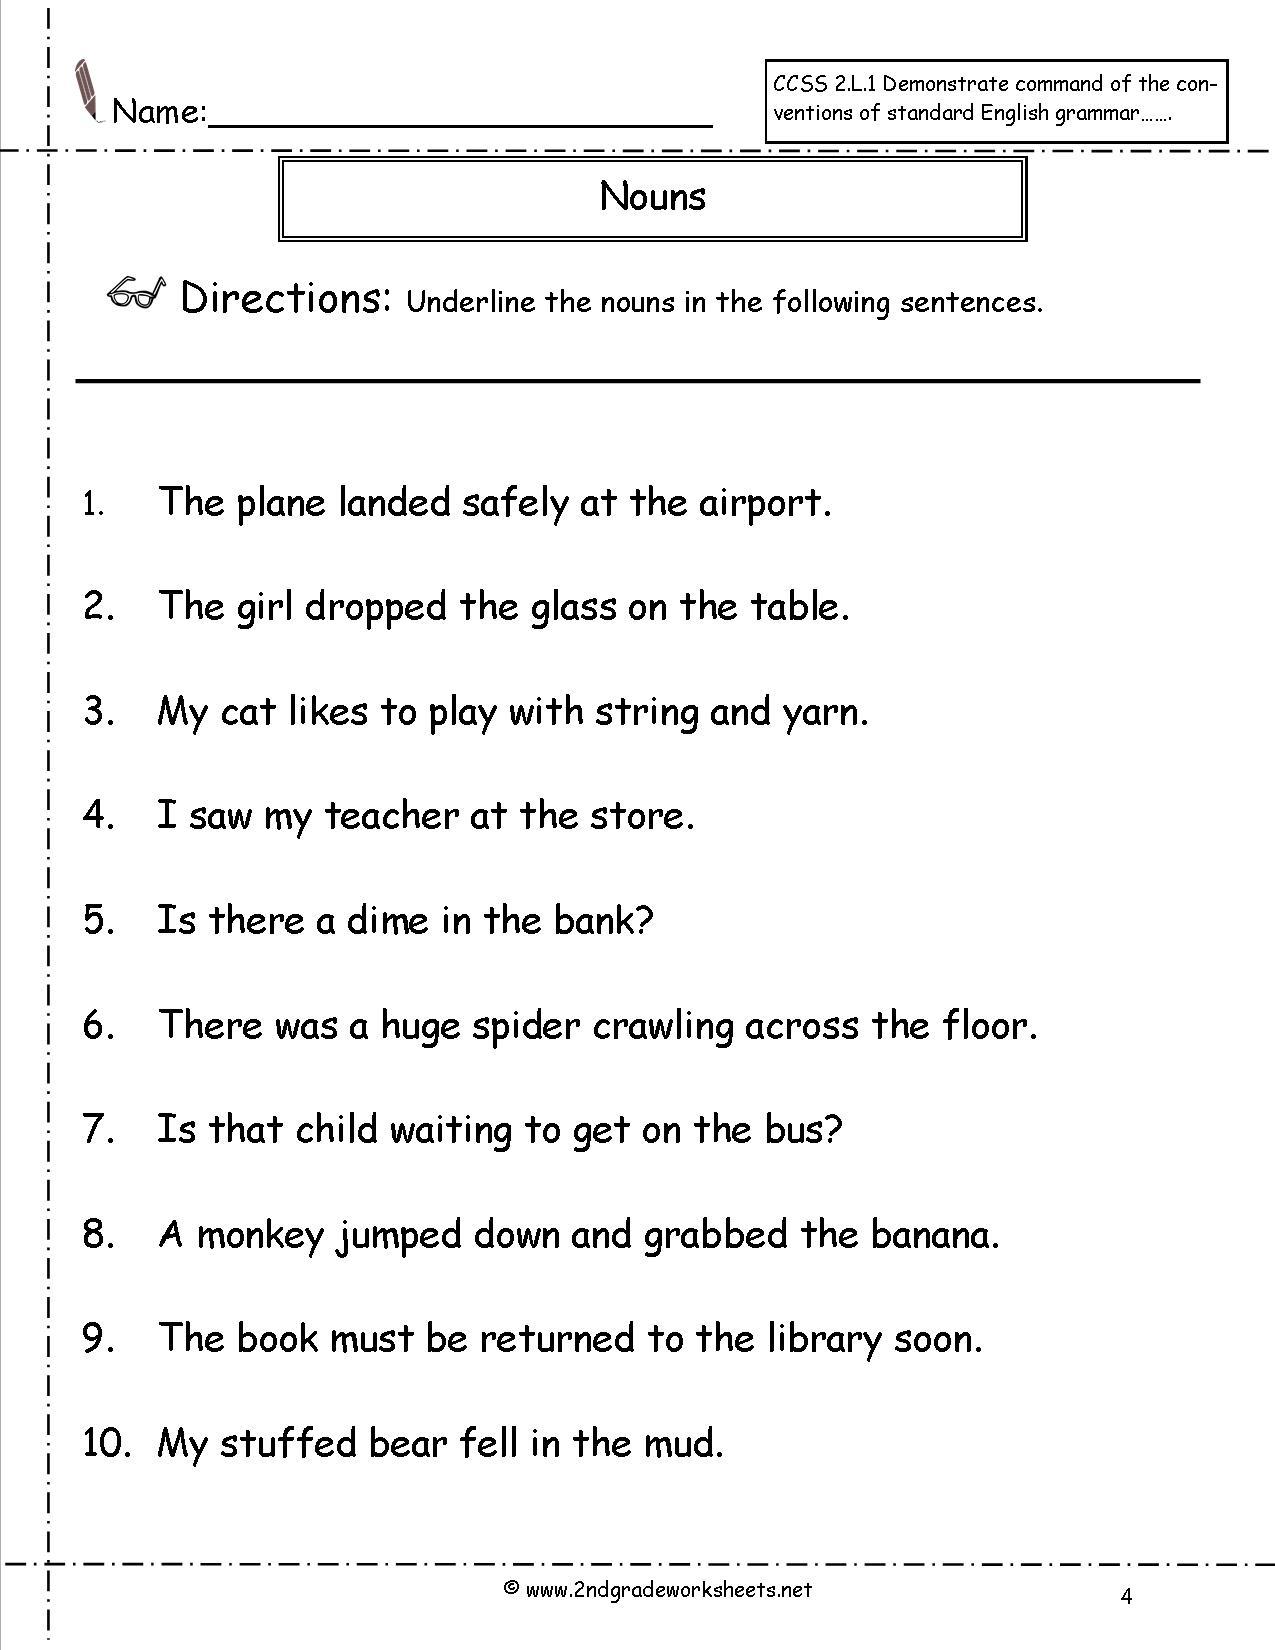 Worksheet For Grade 1 English Nouns  1255800